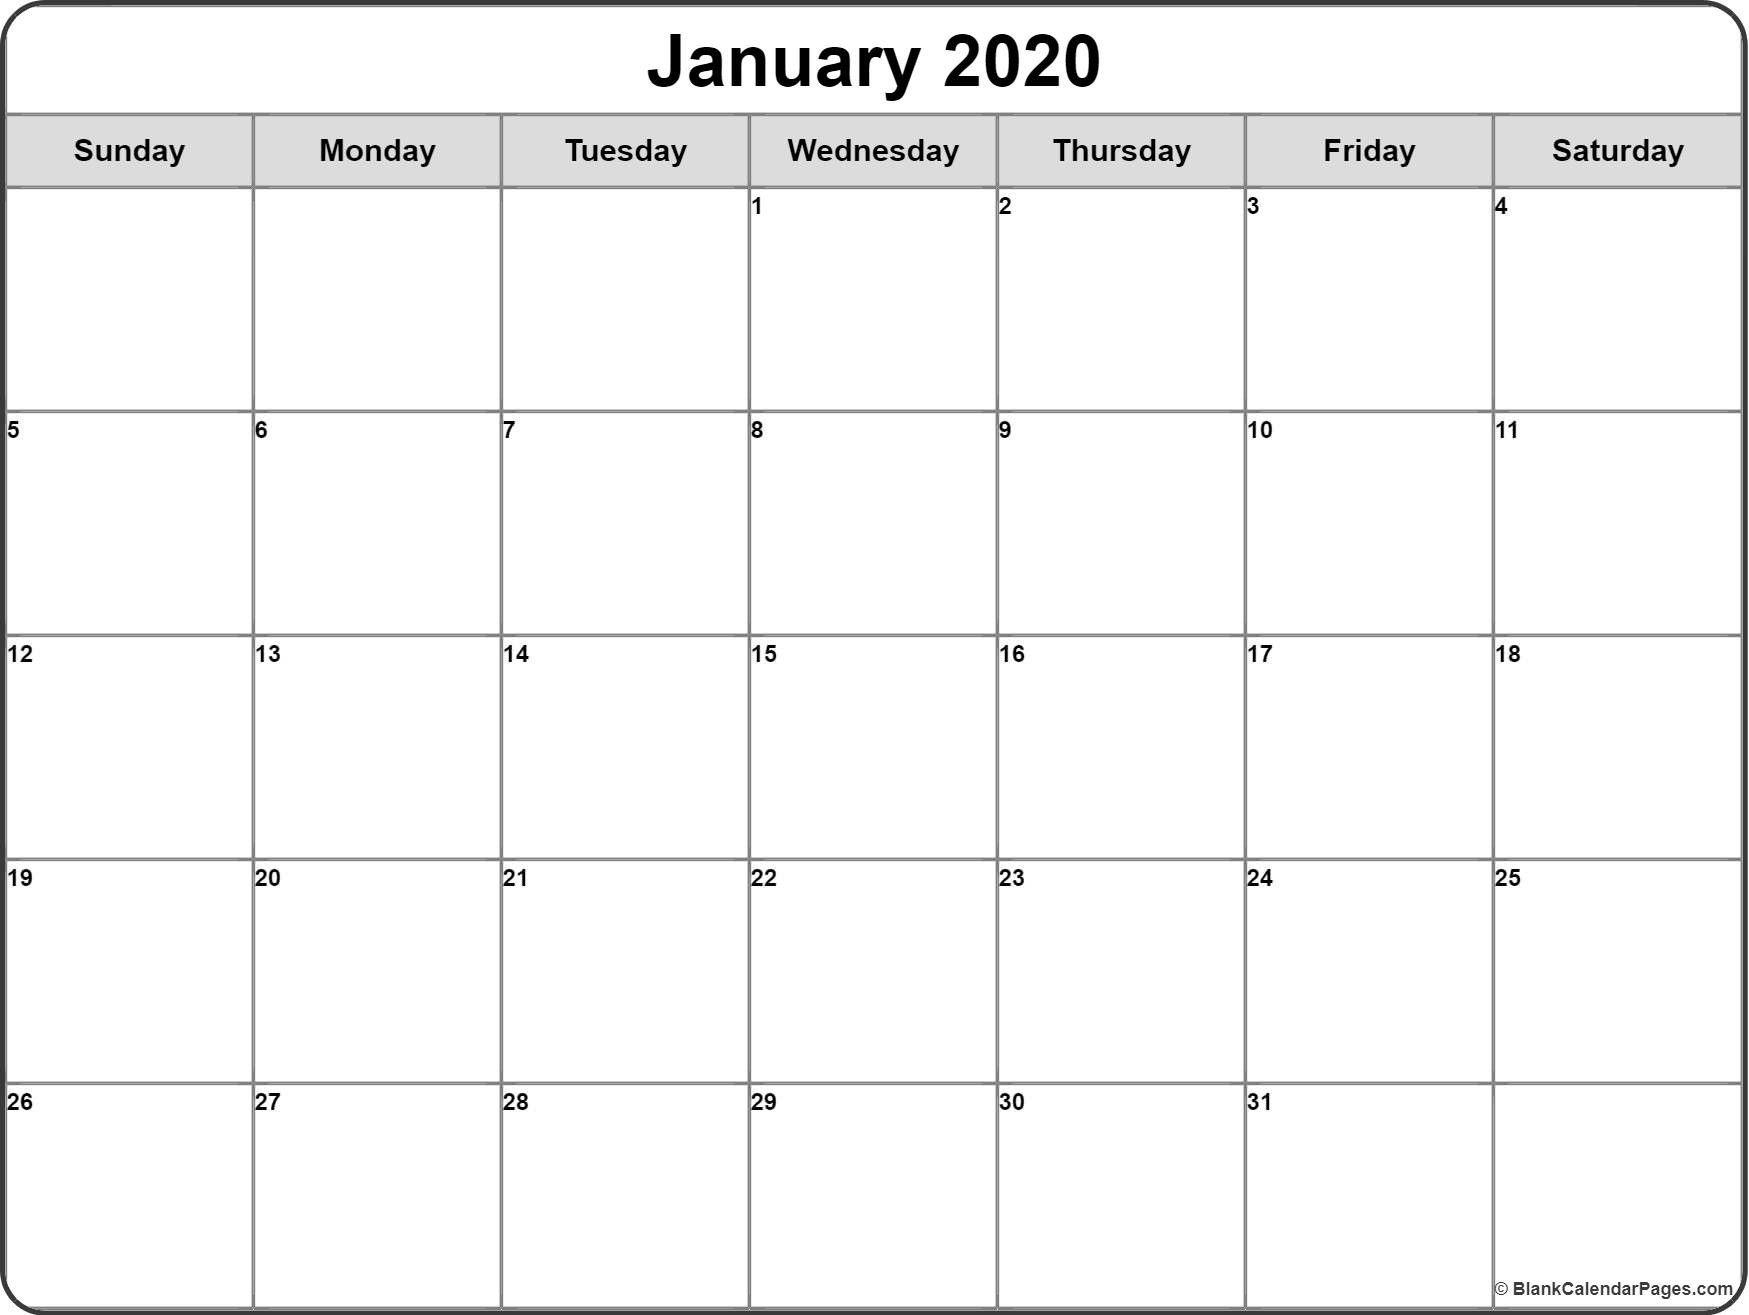 Free 2020 Printable Calendar Template 2 Colors I Free January 2020 Printable Calendar Blank Templates Create Your January 2020 Calendar Printable Editable June Di 2020